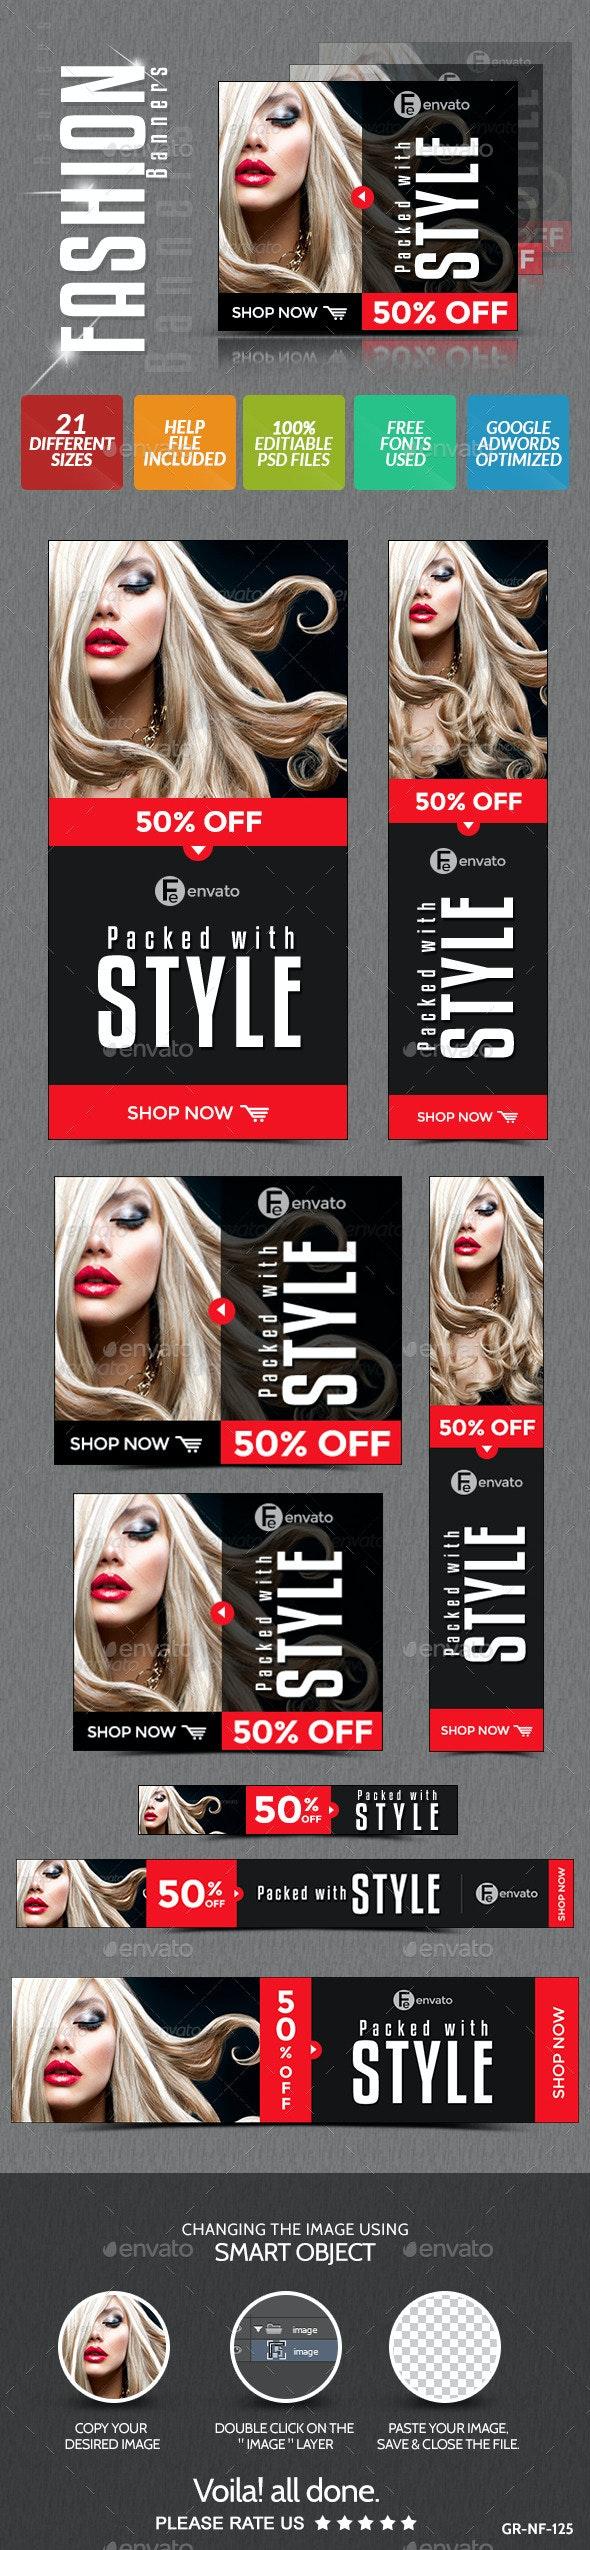 Fashion & Retail Banner Design - Banners & Ads Web Elements